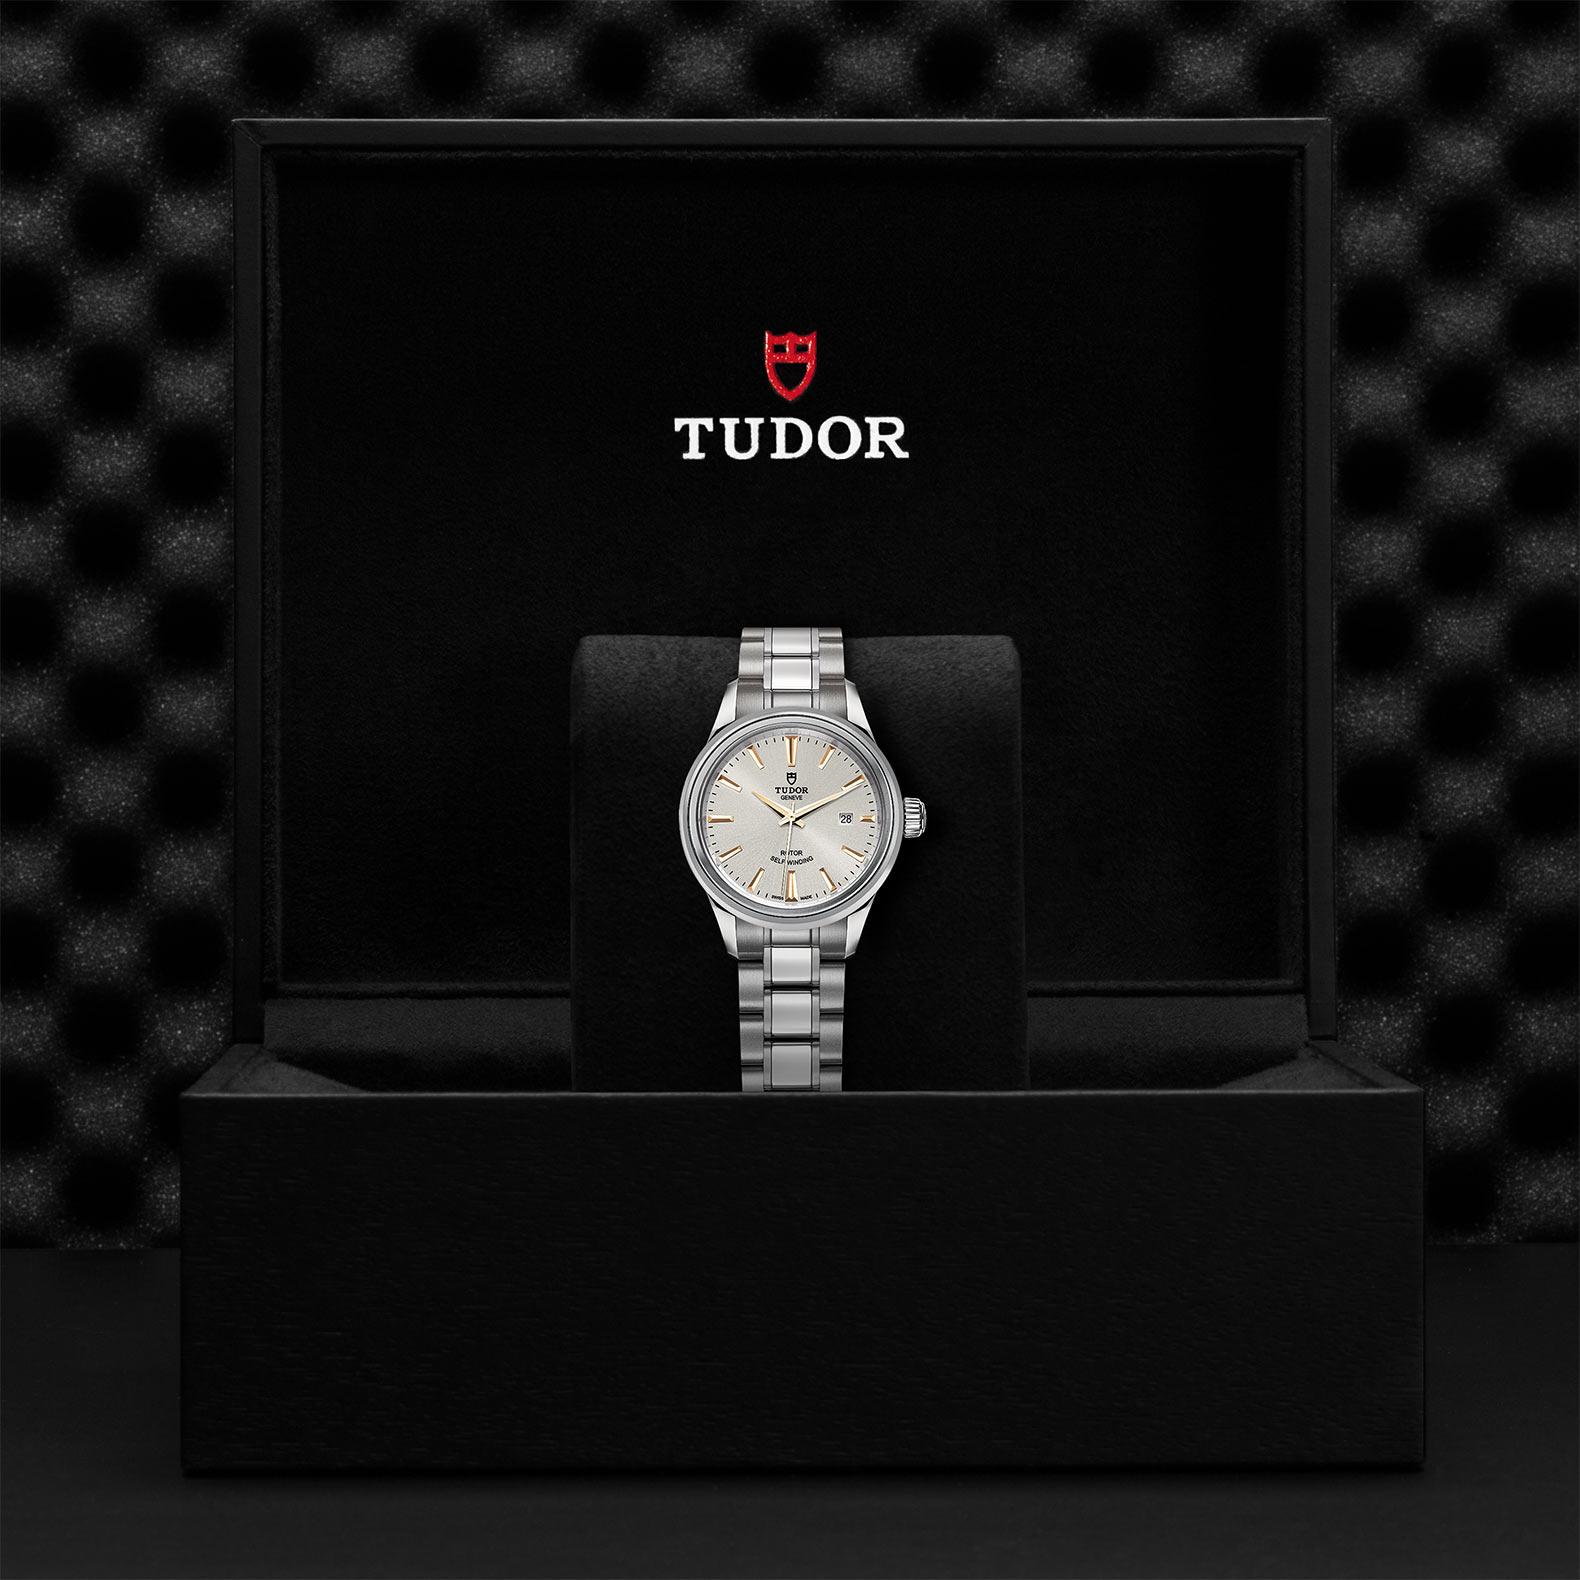 TUDOR Style M12100 0017 Presentationbox